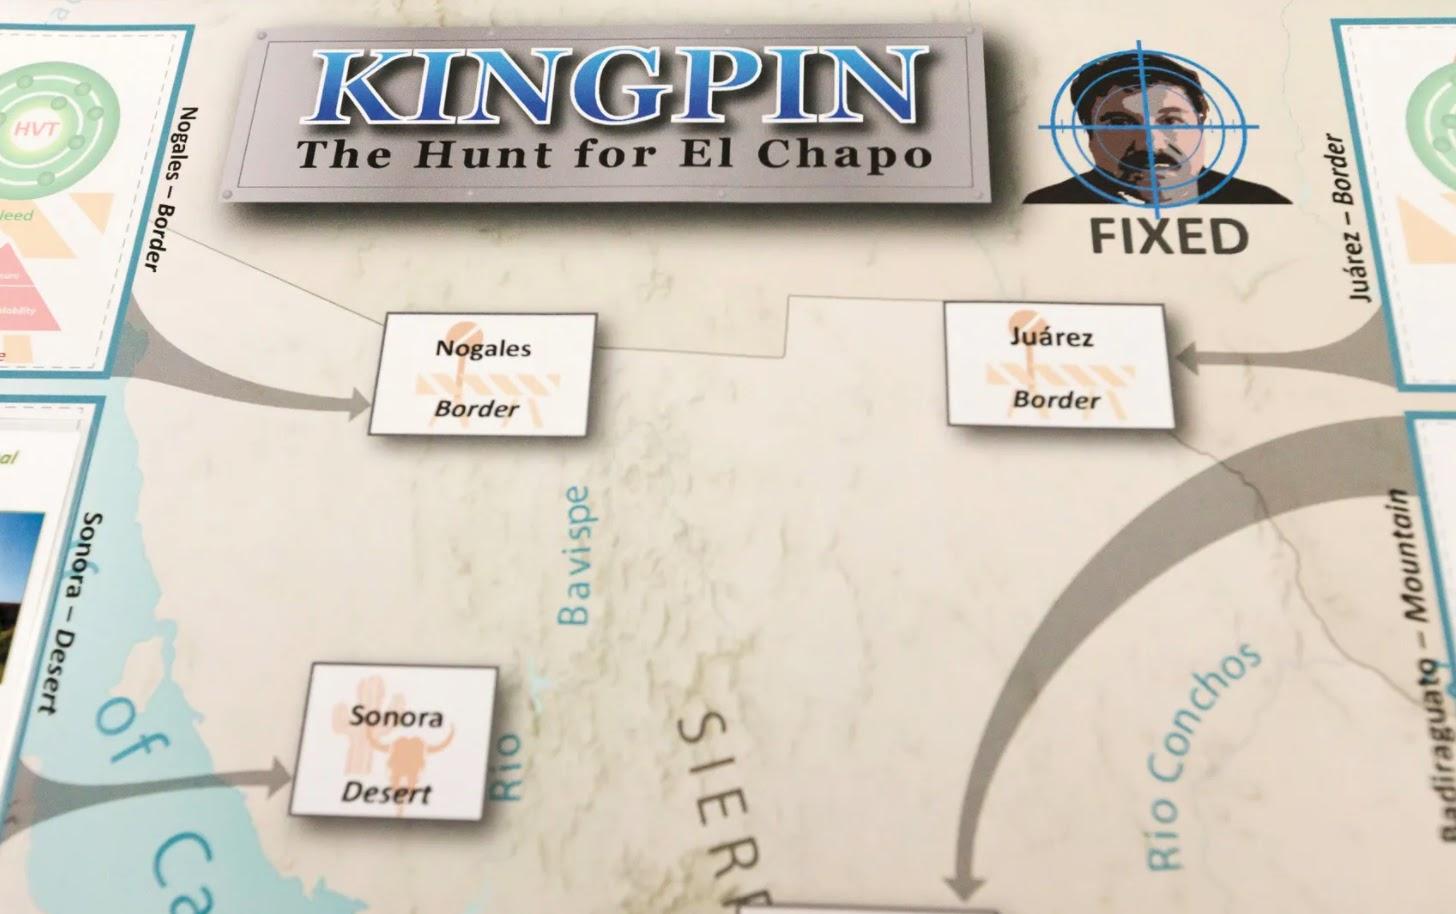 The CIA's Kingin, The Hung for El Chapo